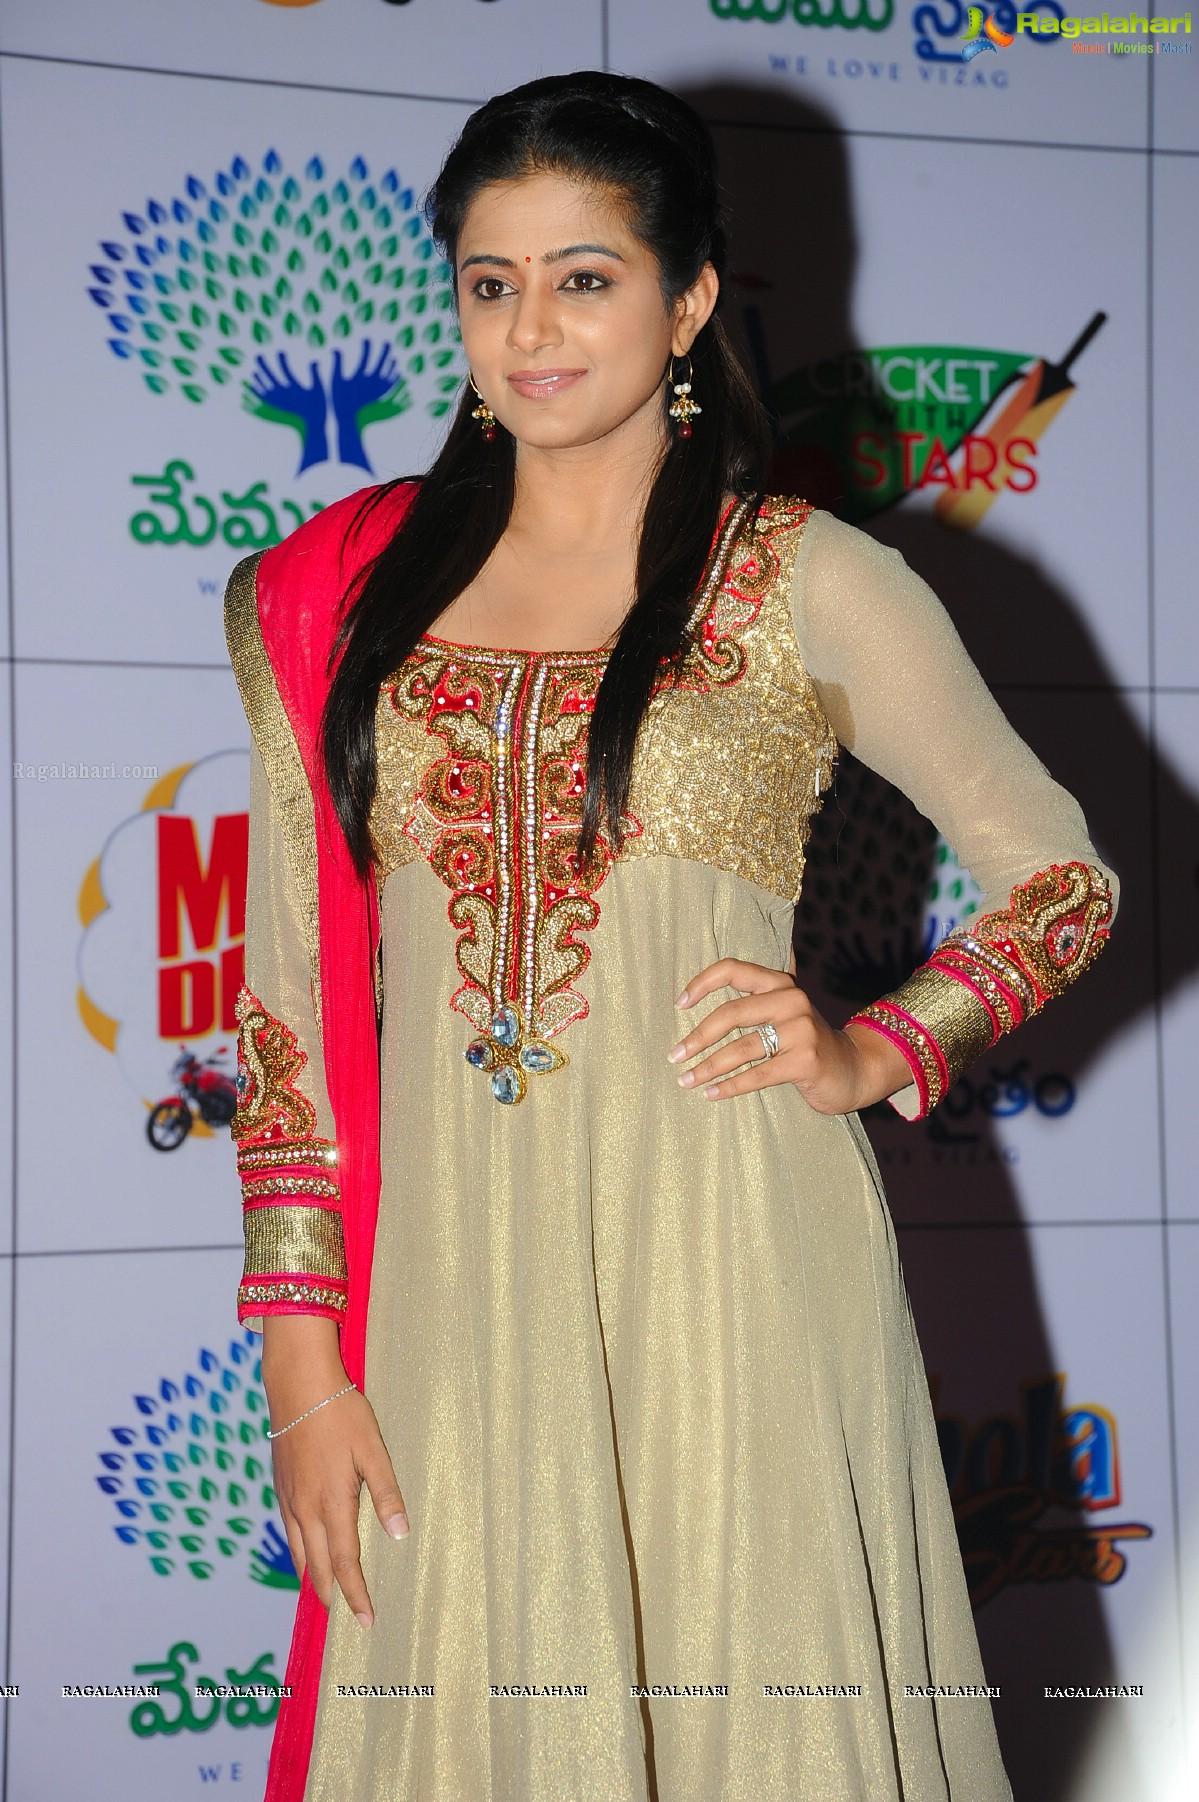 Priyamani at Memu Saitham Dinner with Stars, Exclusive Photos